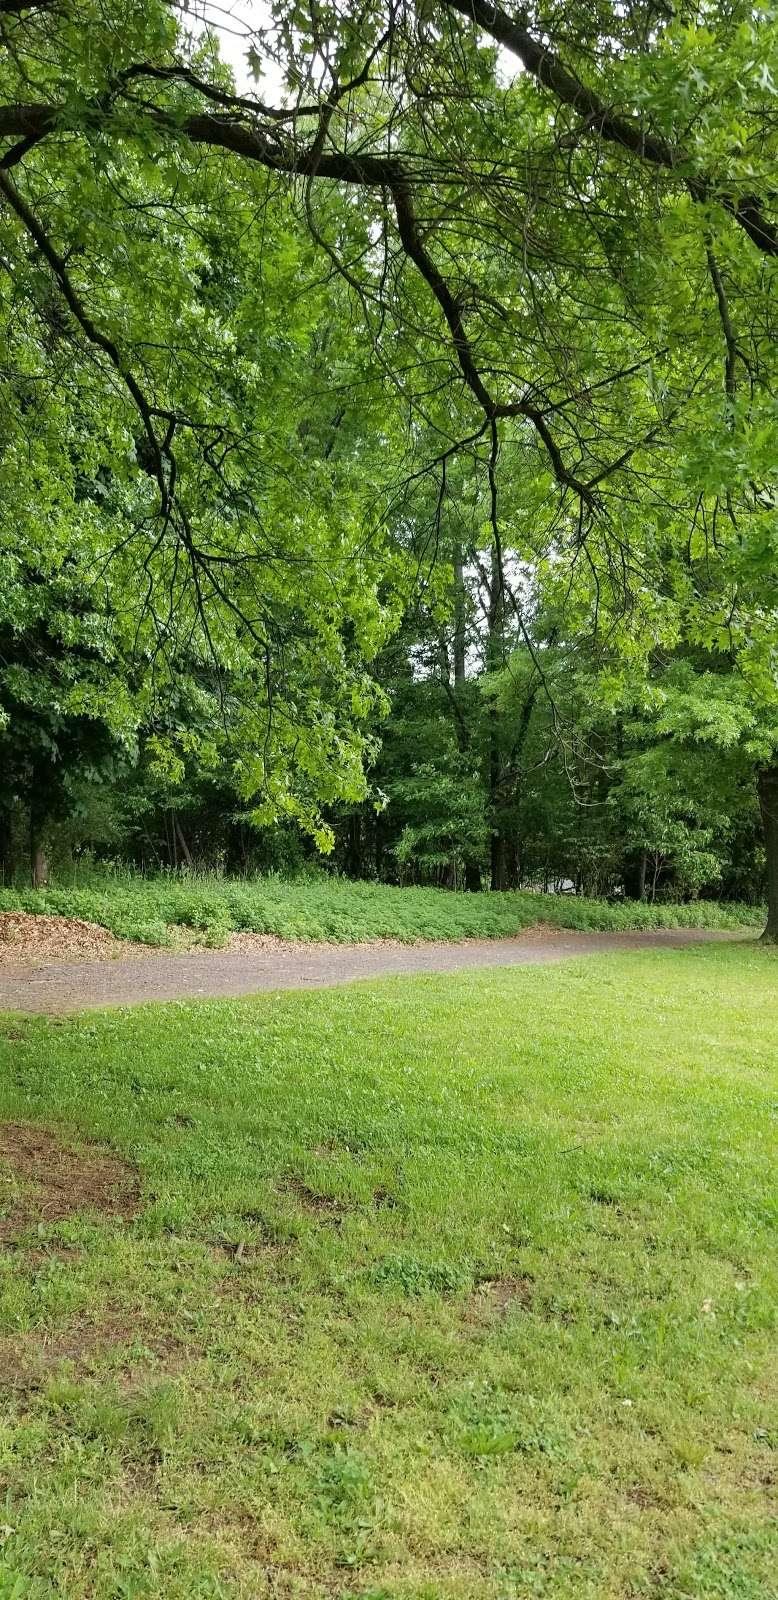 Vivyen Field - park    Photo 3 of 10   Address: 299 N Vivyen St, Bergenfield, NJ 07621, USA